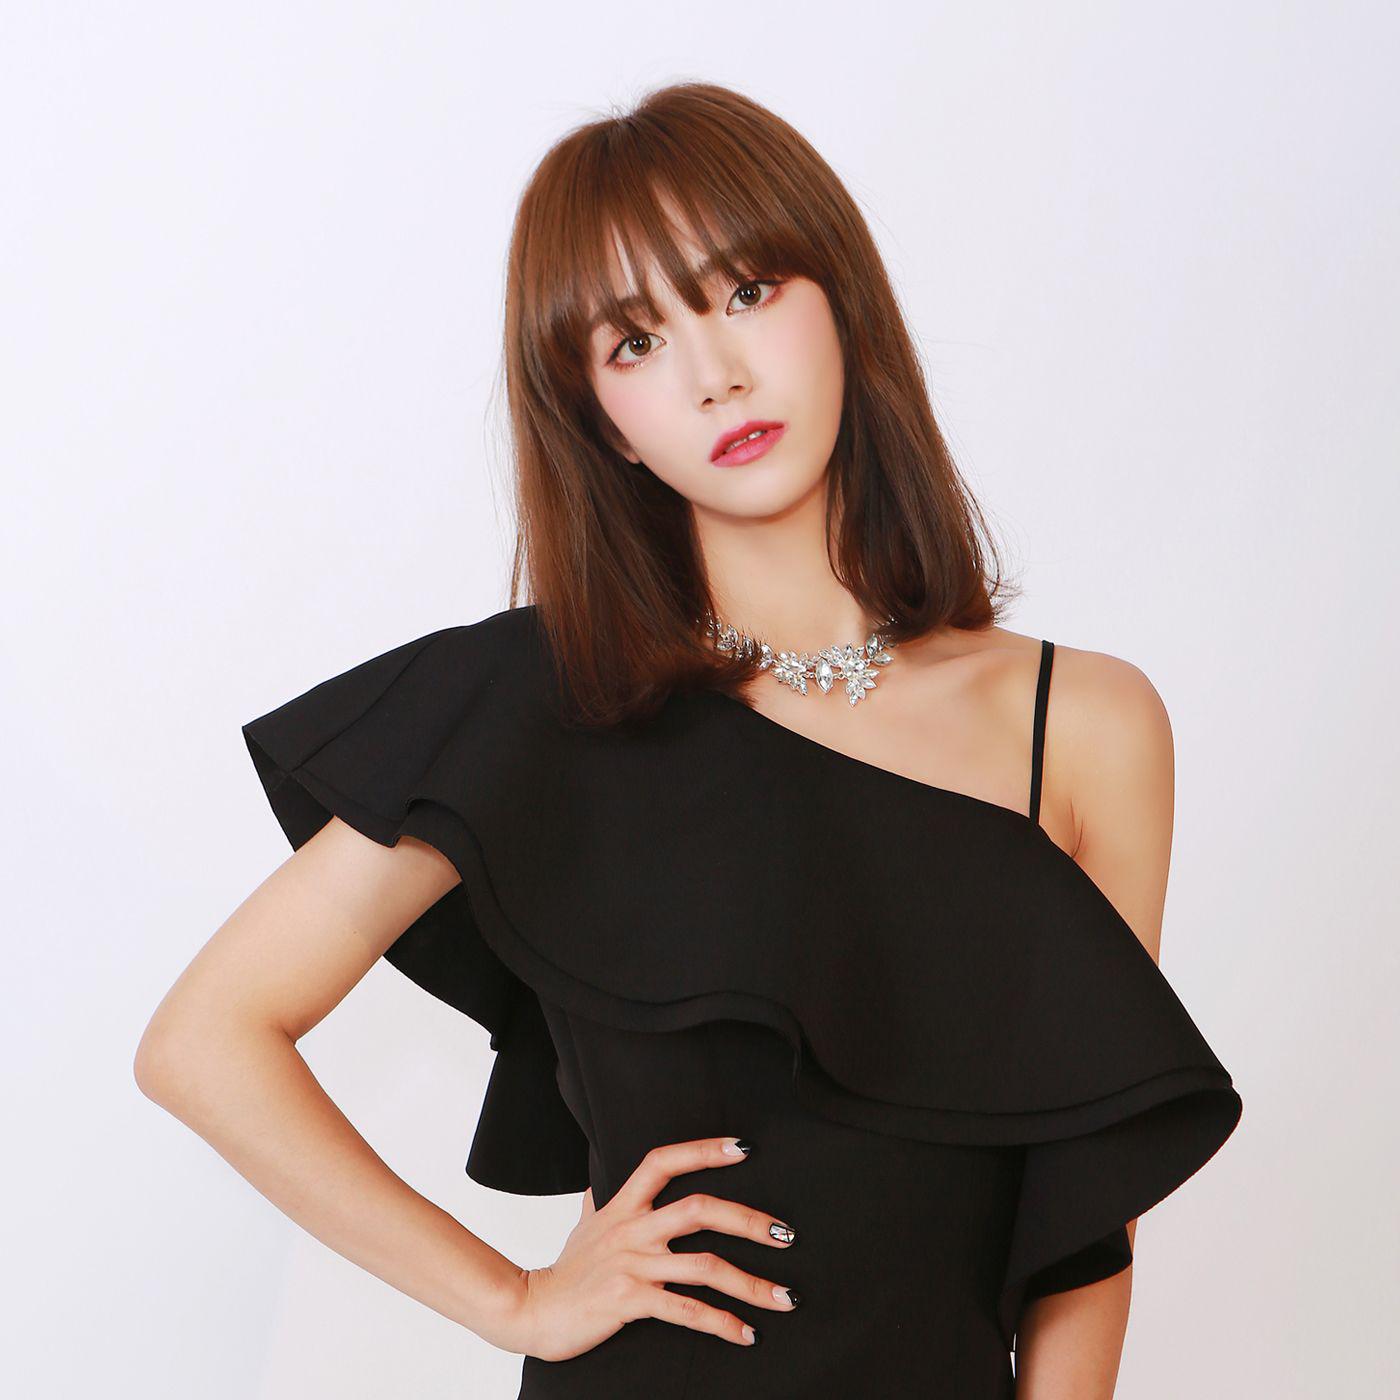 Ga Hyeon (ALiKE)